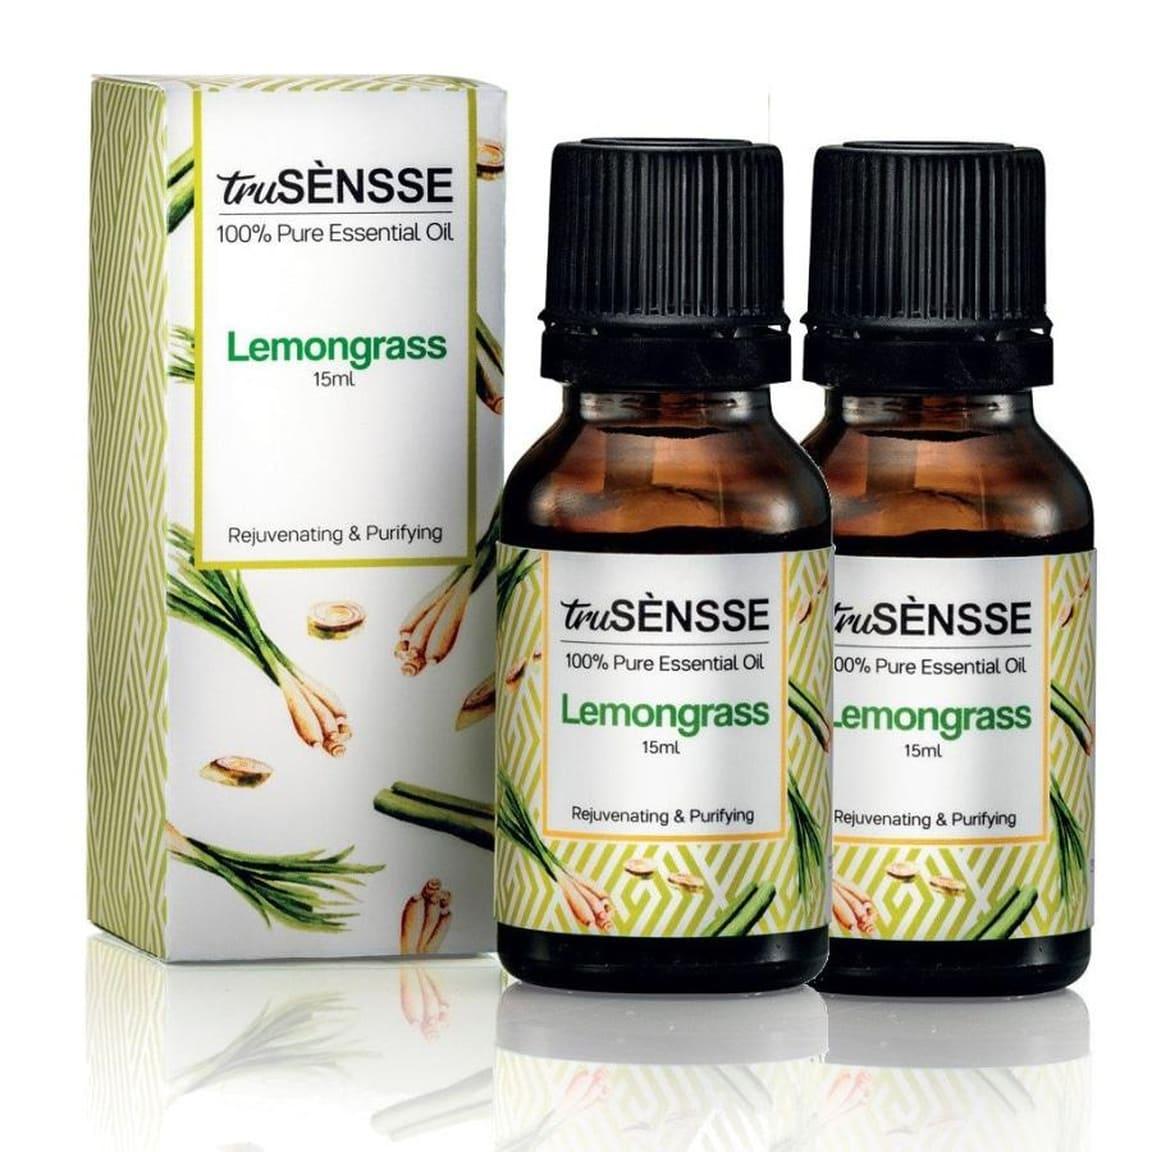 truSÈNSSE 100% Pure Essential Oil - Lemongrass Twin Pack (2) 15ml